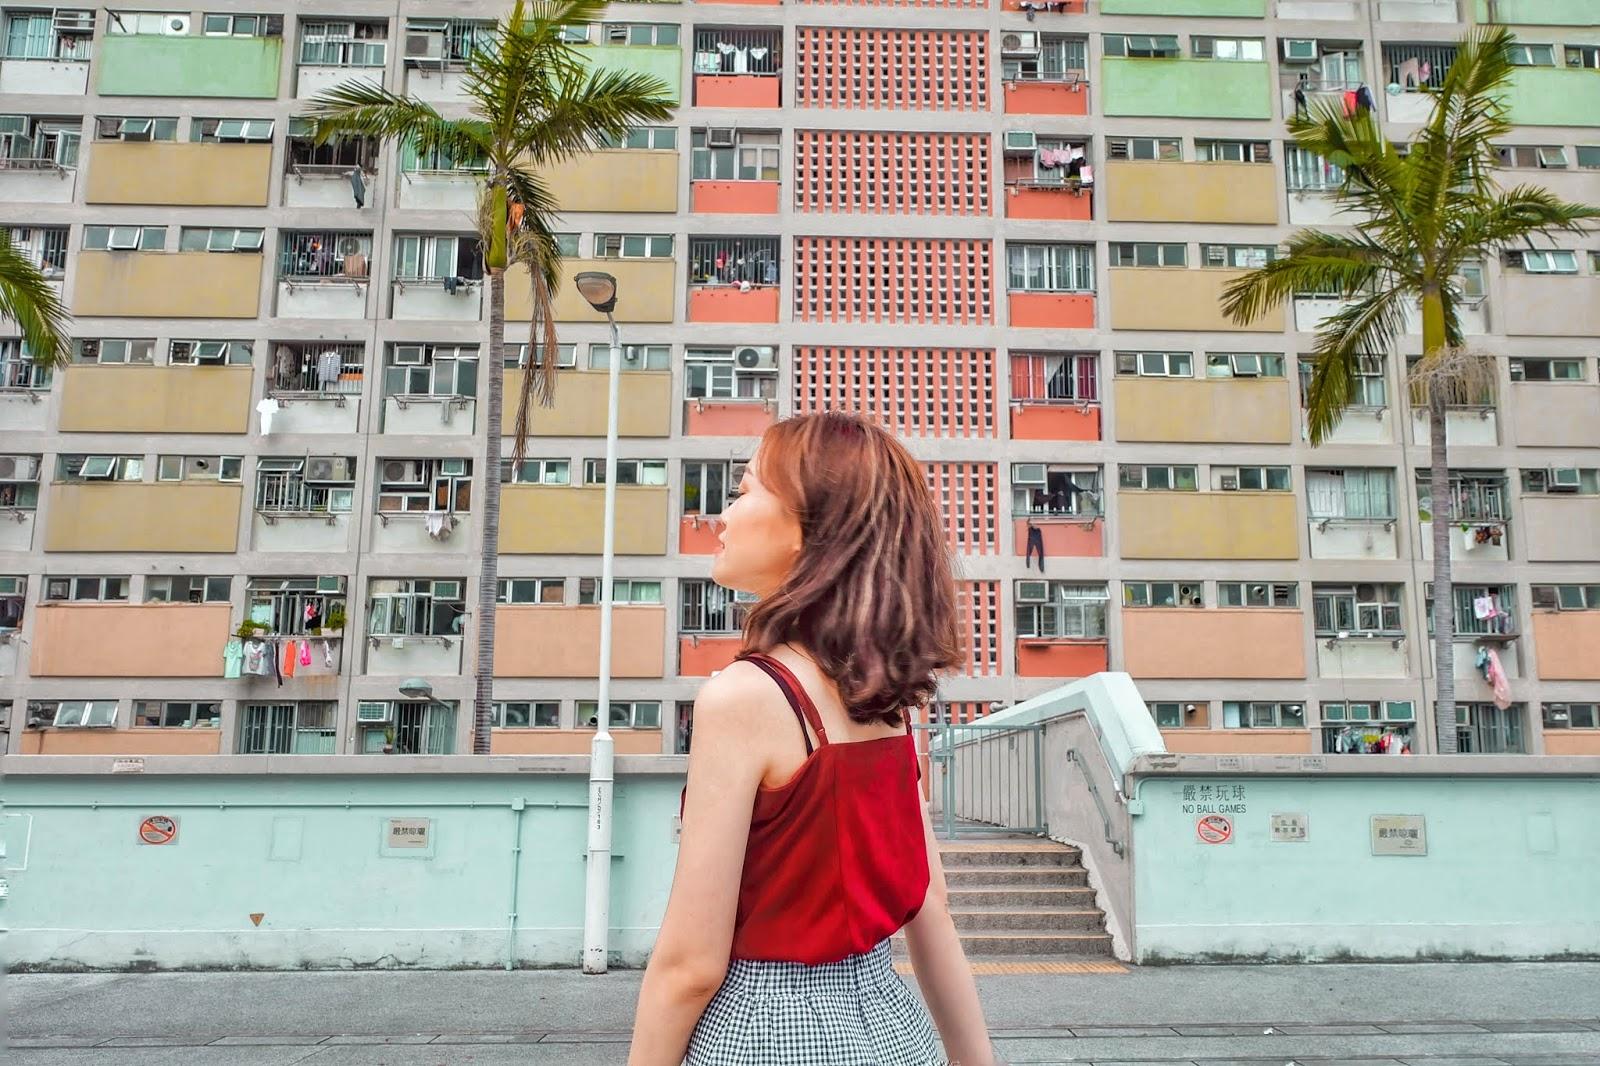 HONG KONG & MACAU 5D4N ITINERARY - Eunice C